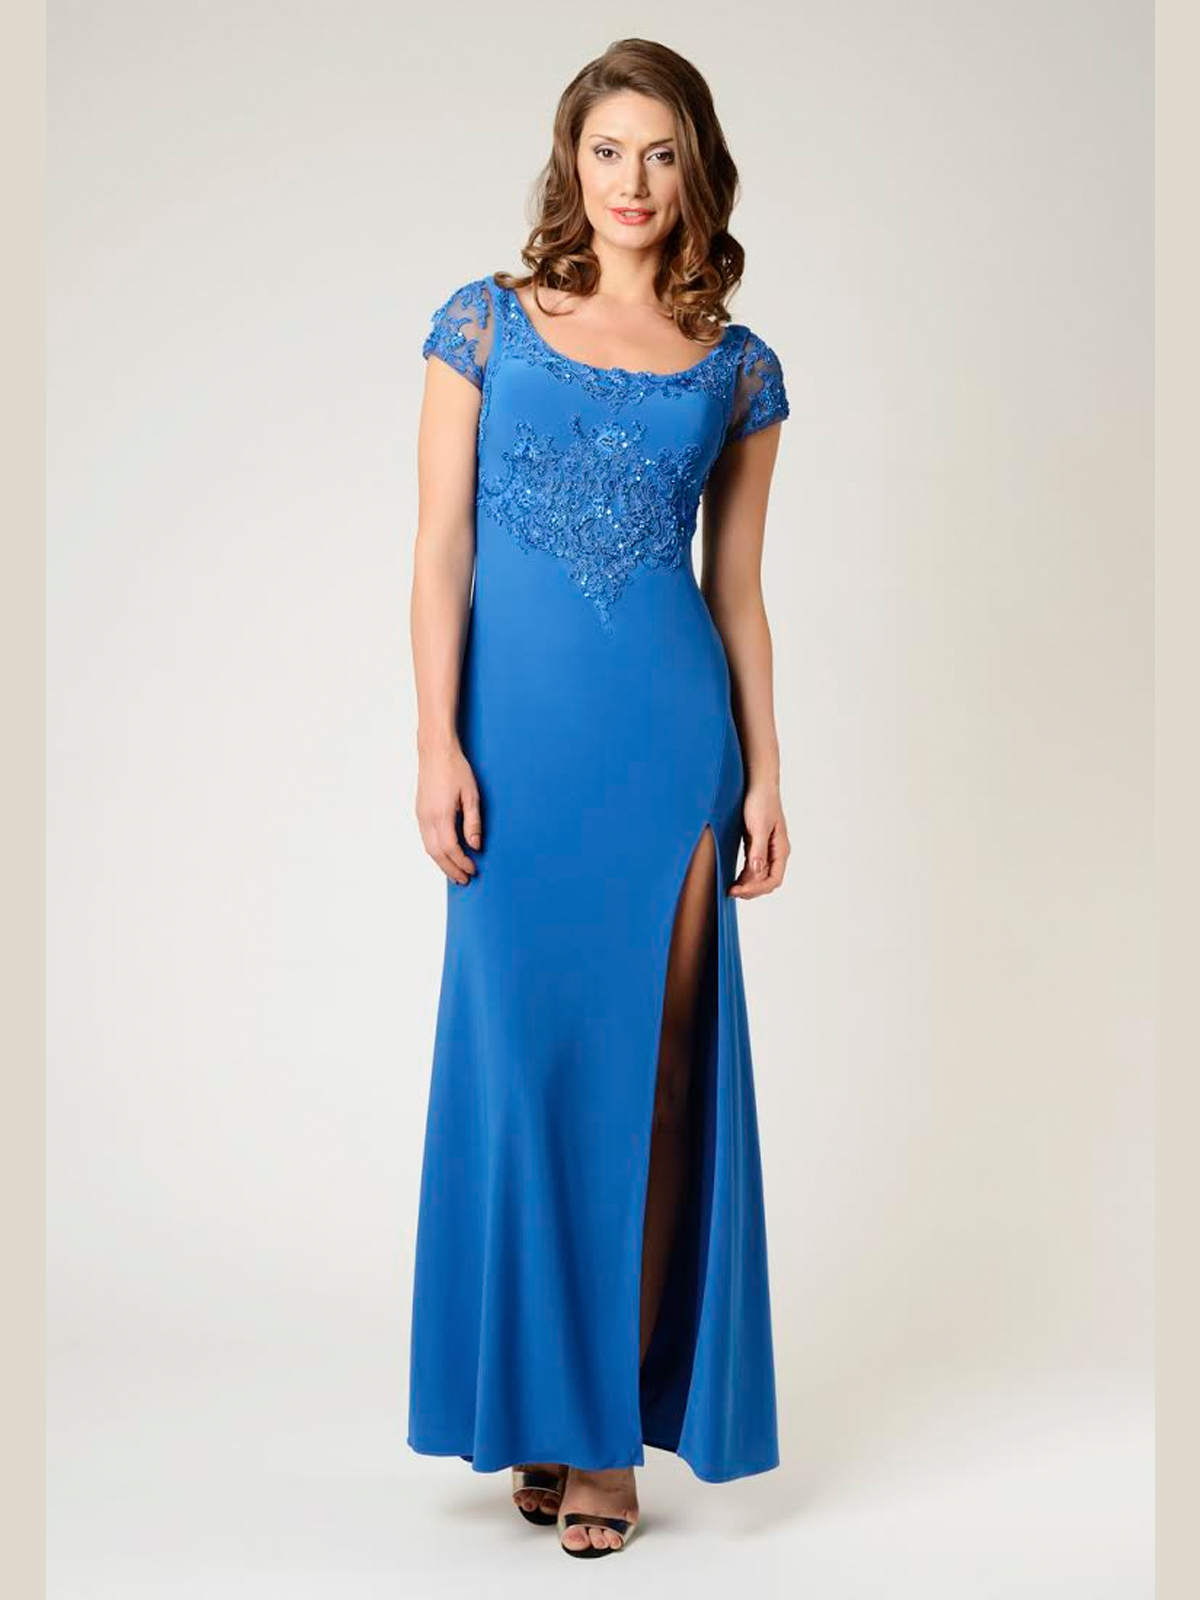 Vintage Prom Dresses Dallas Cocktail Dresses 2016